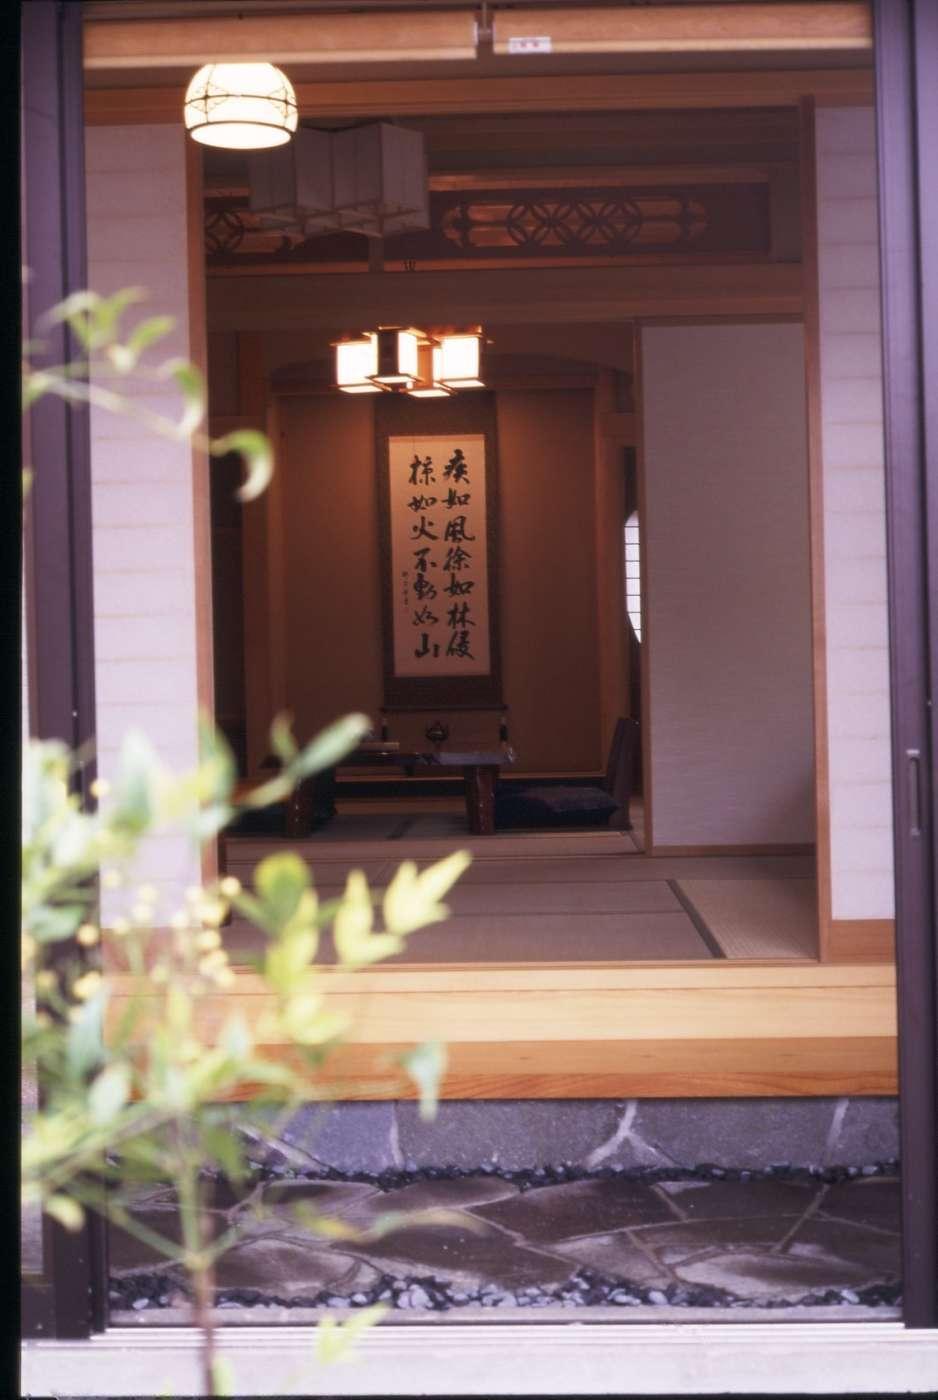 http://sumainomatsuki.com/folder1/%E5%B1%95%E7%A4%BA%E5%A0%B4017.jpg